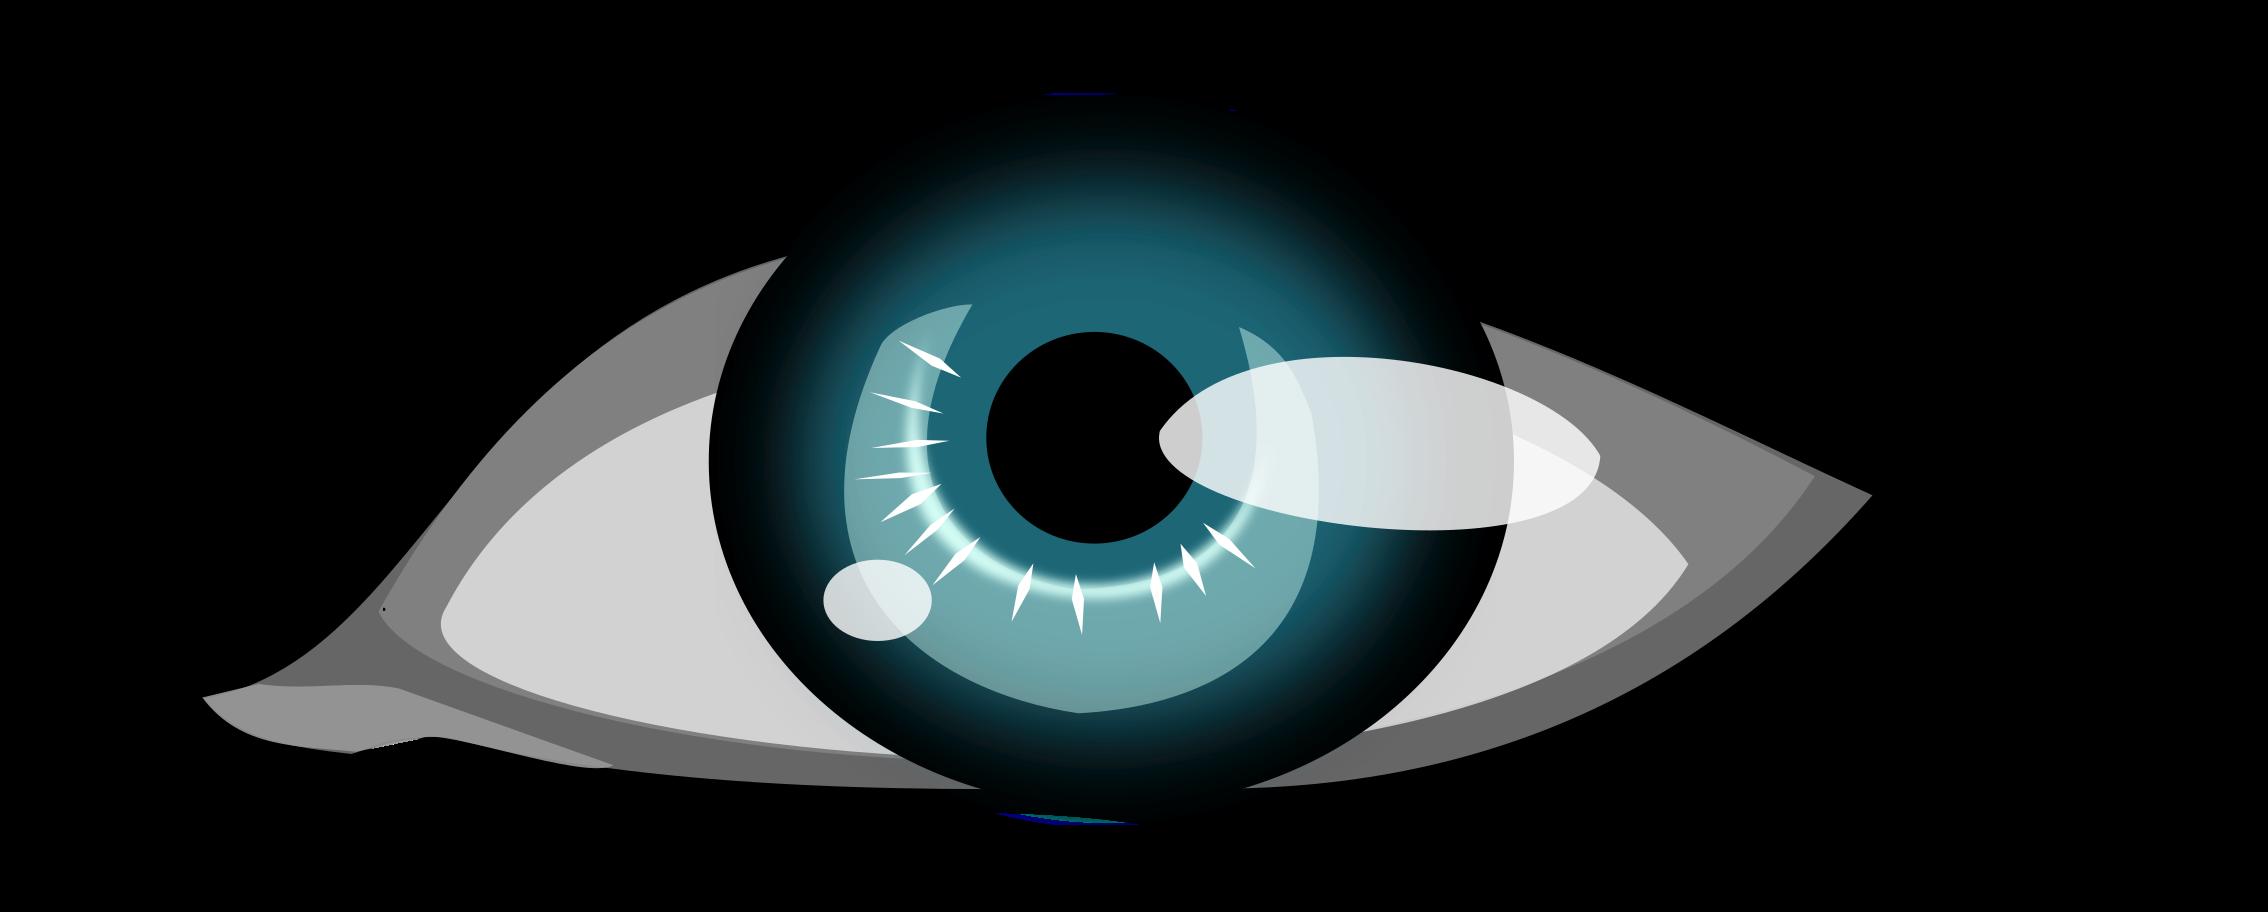 Illustration Of A Human Eye - Blue Eye Clip Art (2400x1267)